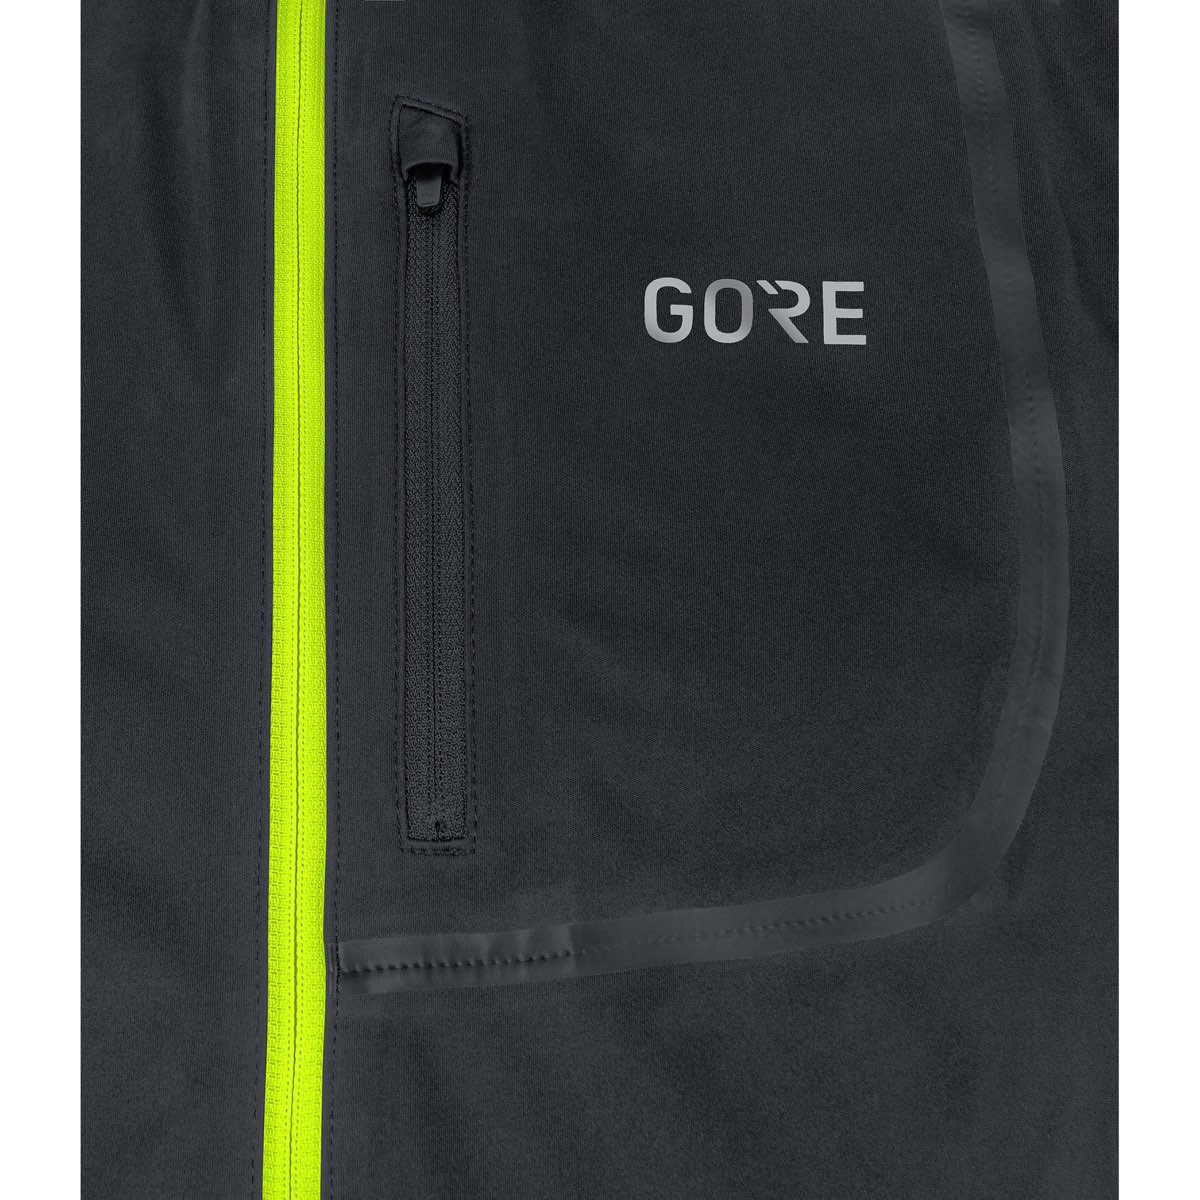 3a237888b Gore® C3 Gore® Windstopper® Jacket Black/Neon Yellow